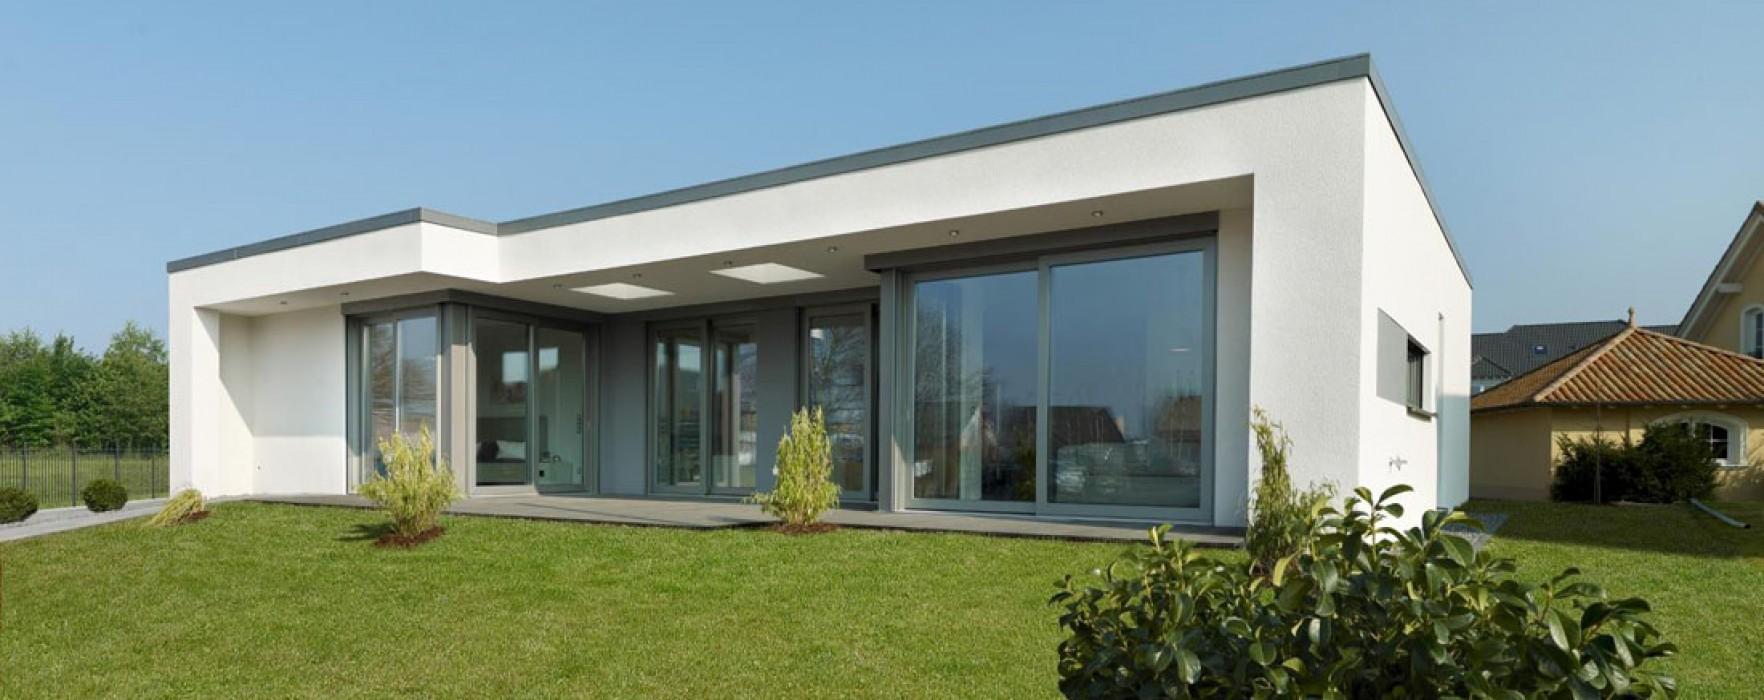 Impianti termici per una casa in x lam for Moderni piani di casa eco